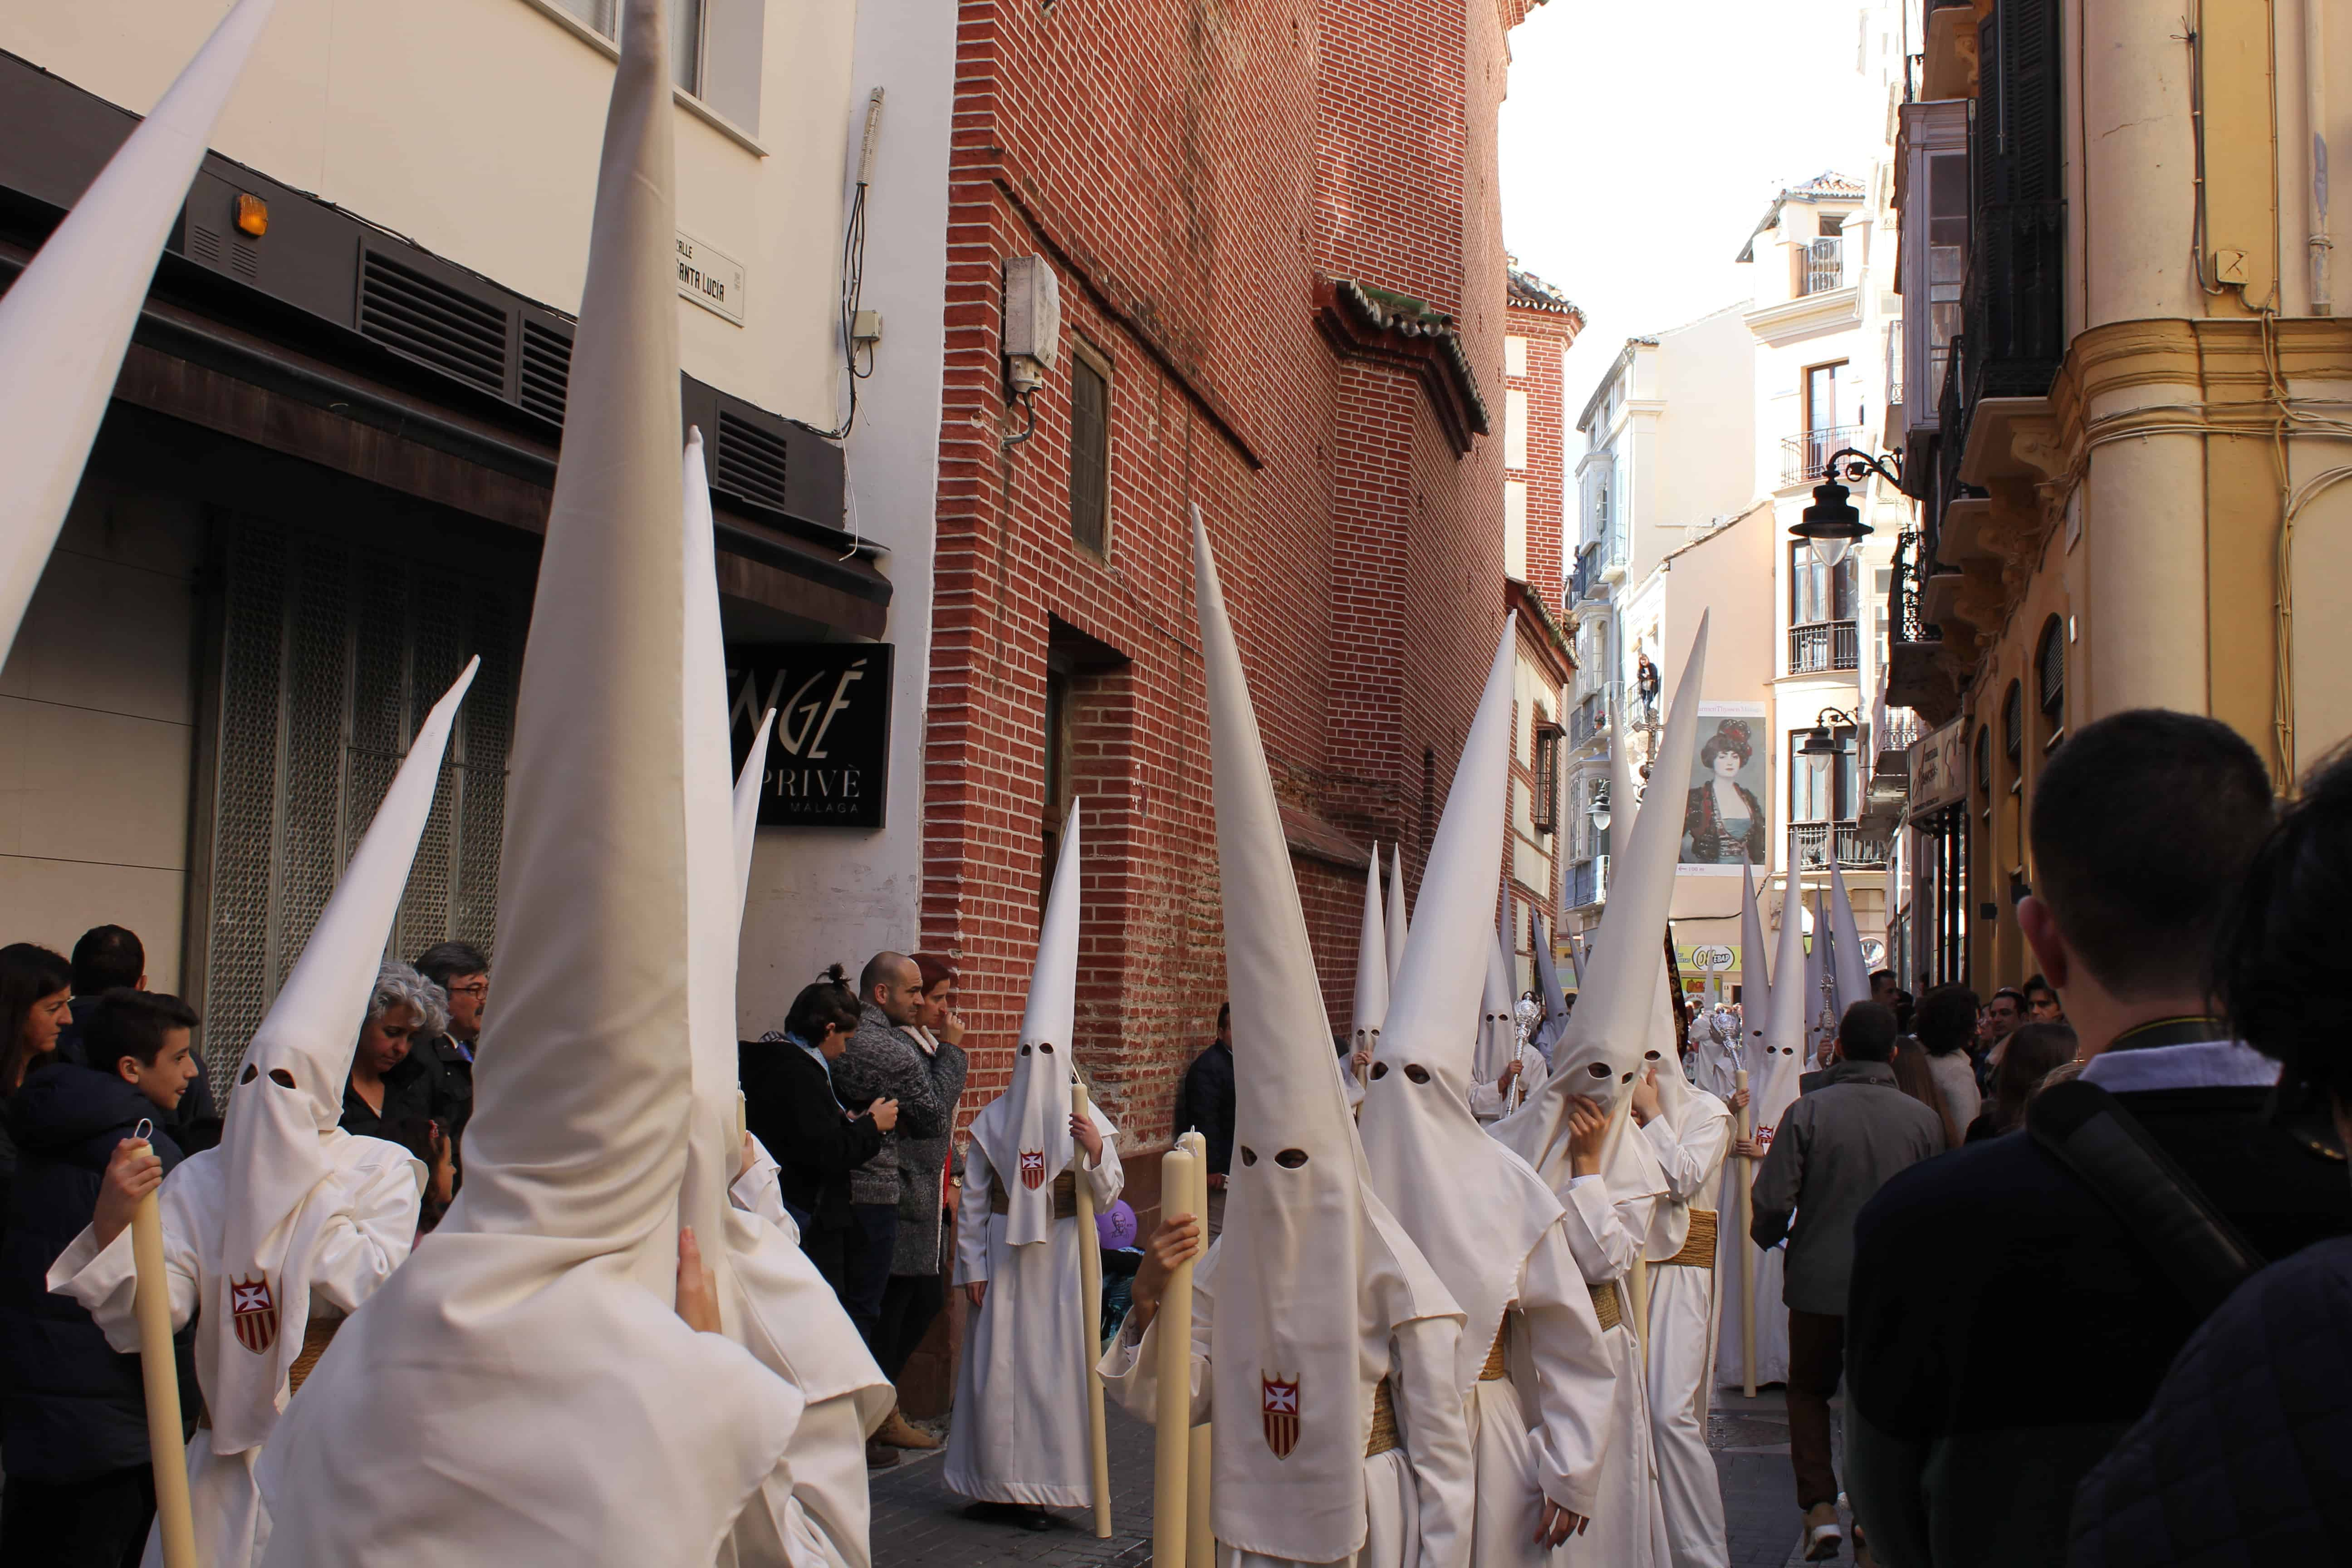 Processions in Malaga, Semana Santa in Malaga Spain, the Holy Week in Malaga Spain